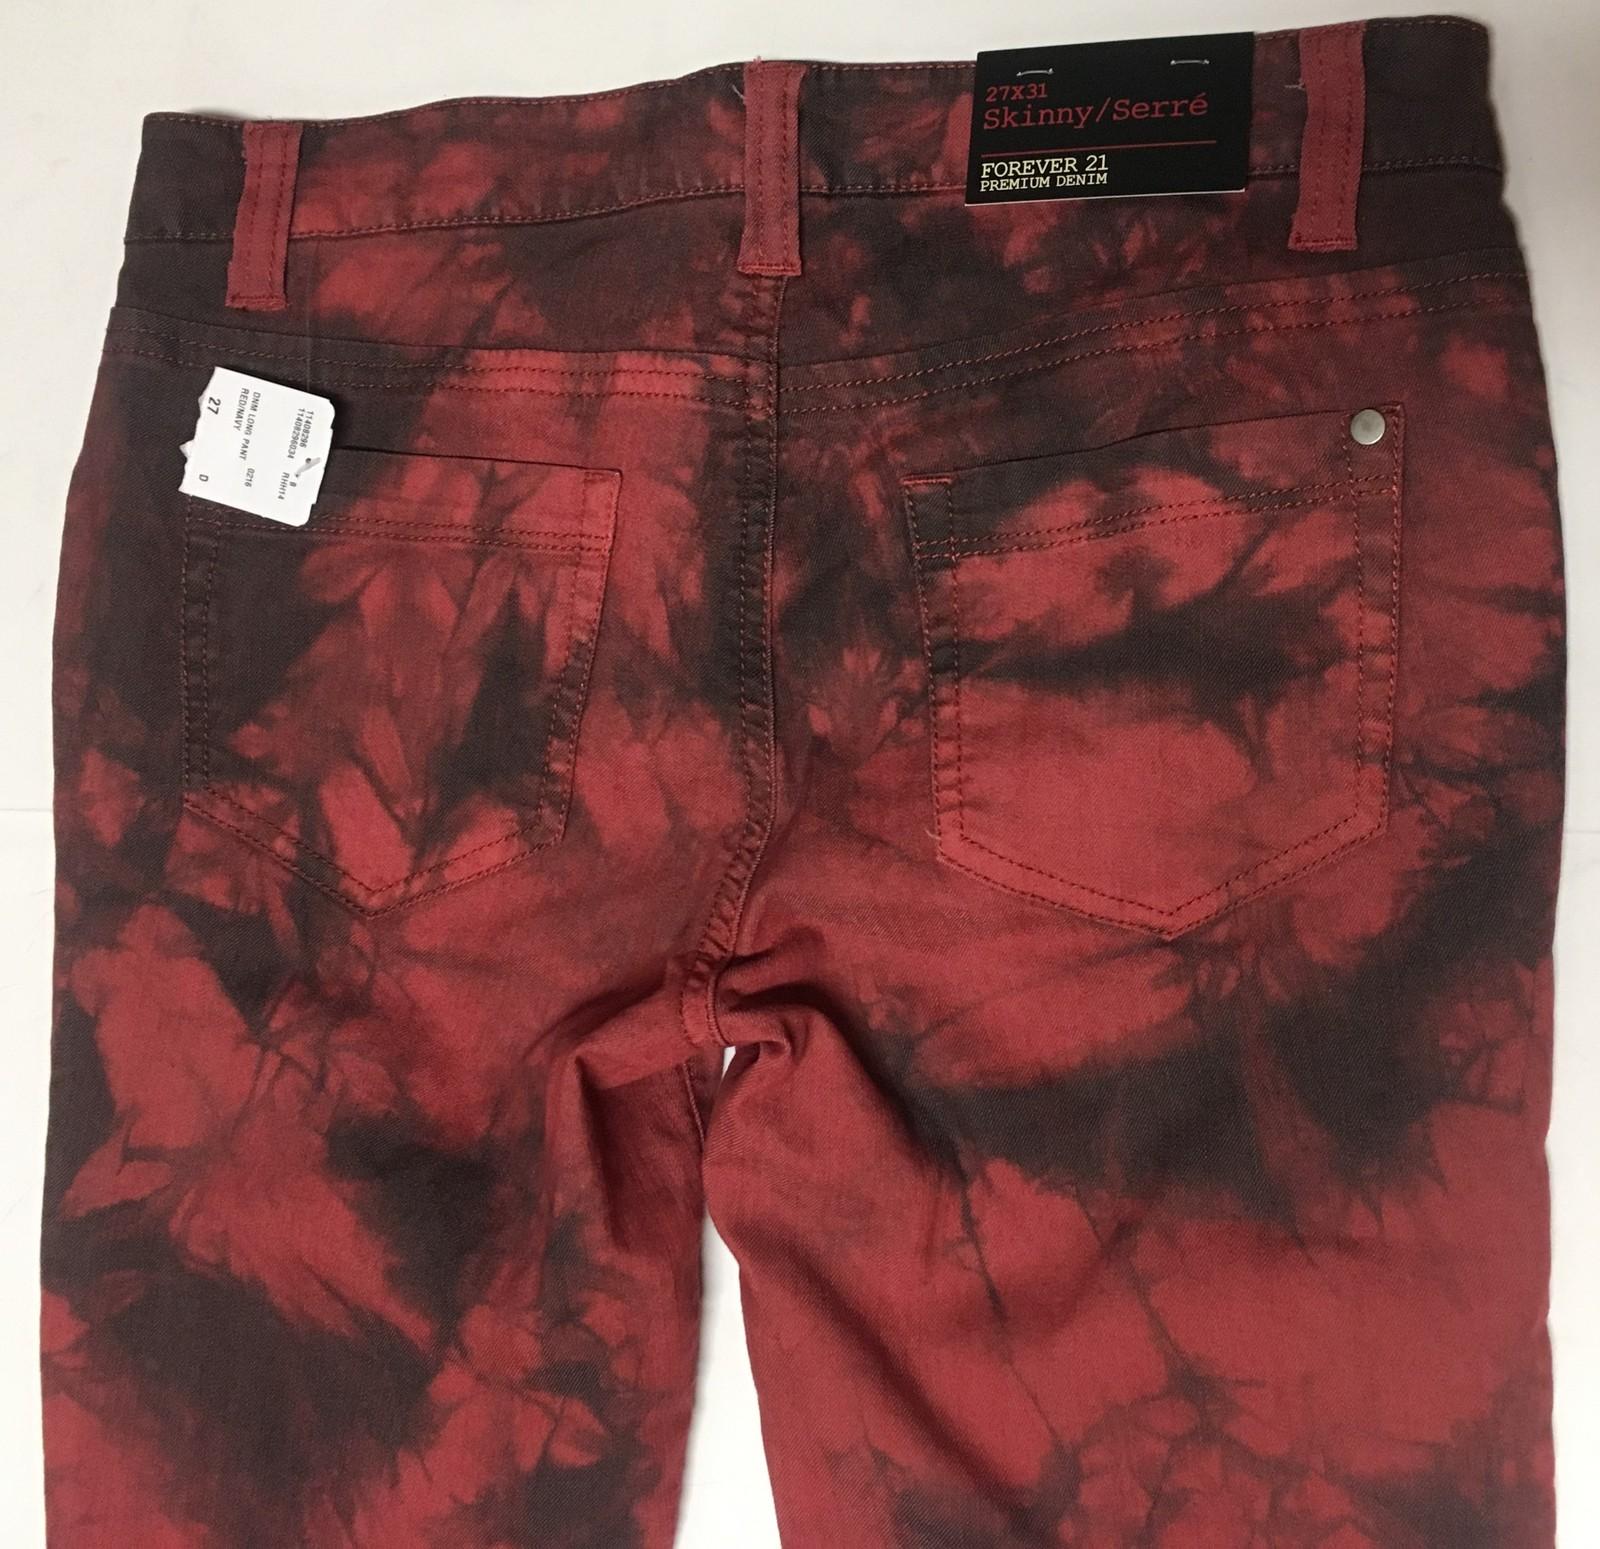 Forever 21 Denim Skinny Jeans Sz 27 x 31 Red & Black Tie Dyed  image 4